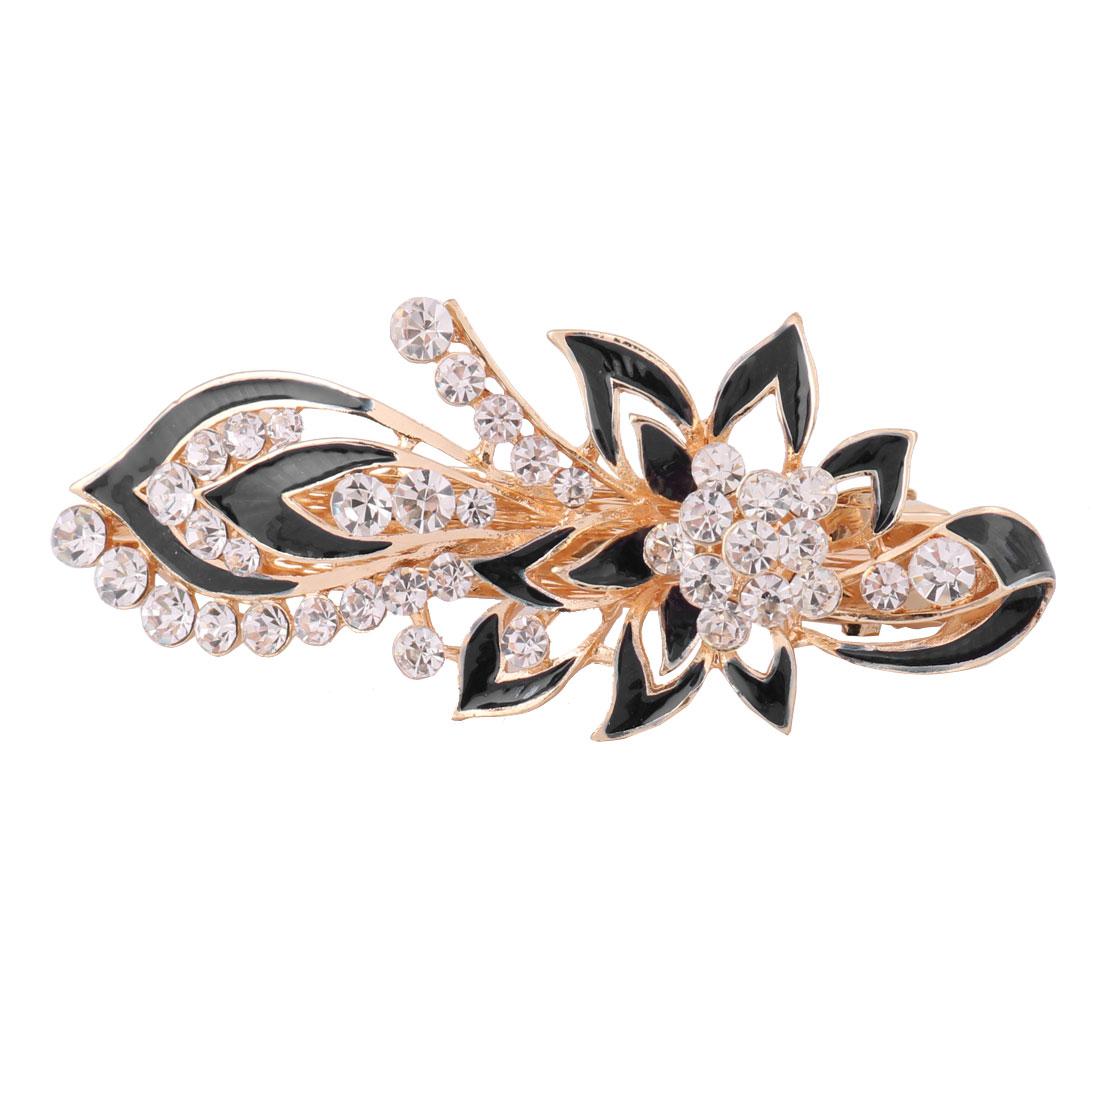 Ladies Metal Flower Design Faux Rhinestones Inlaid Hair Clip Clasp Hairpin Black